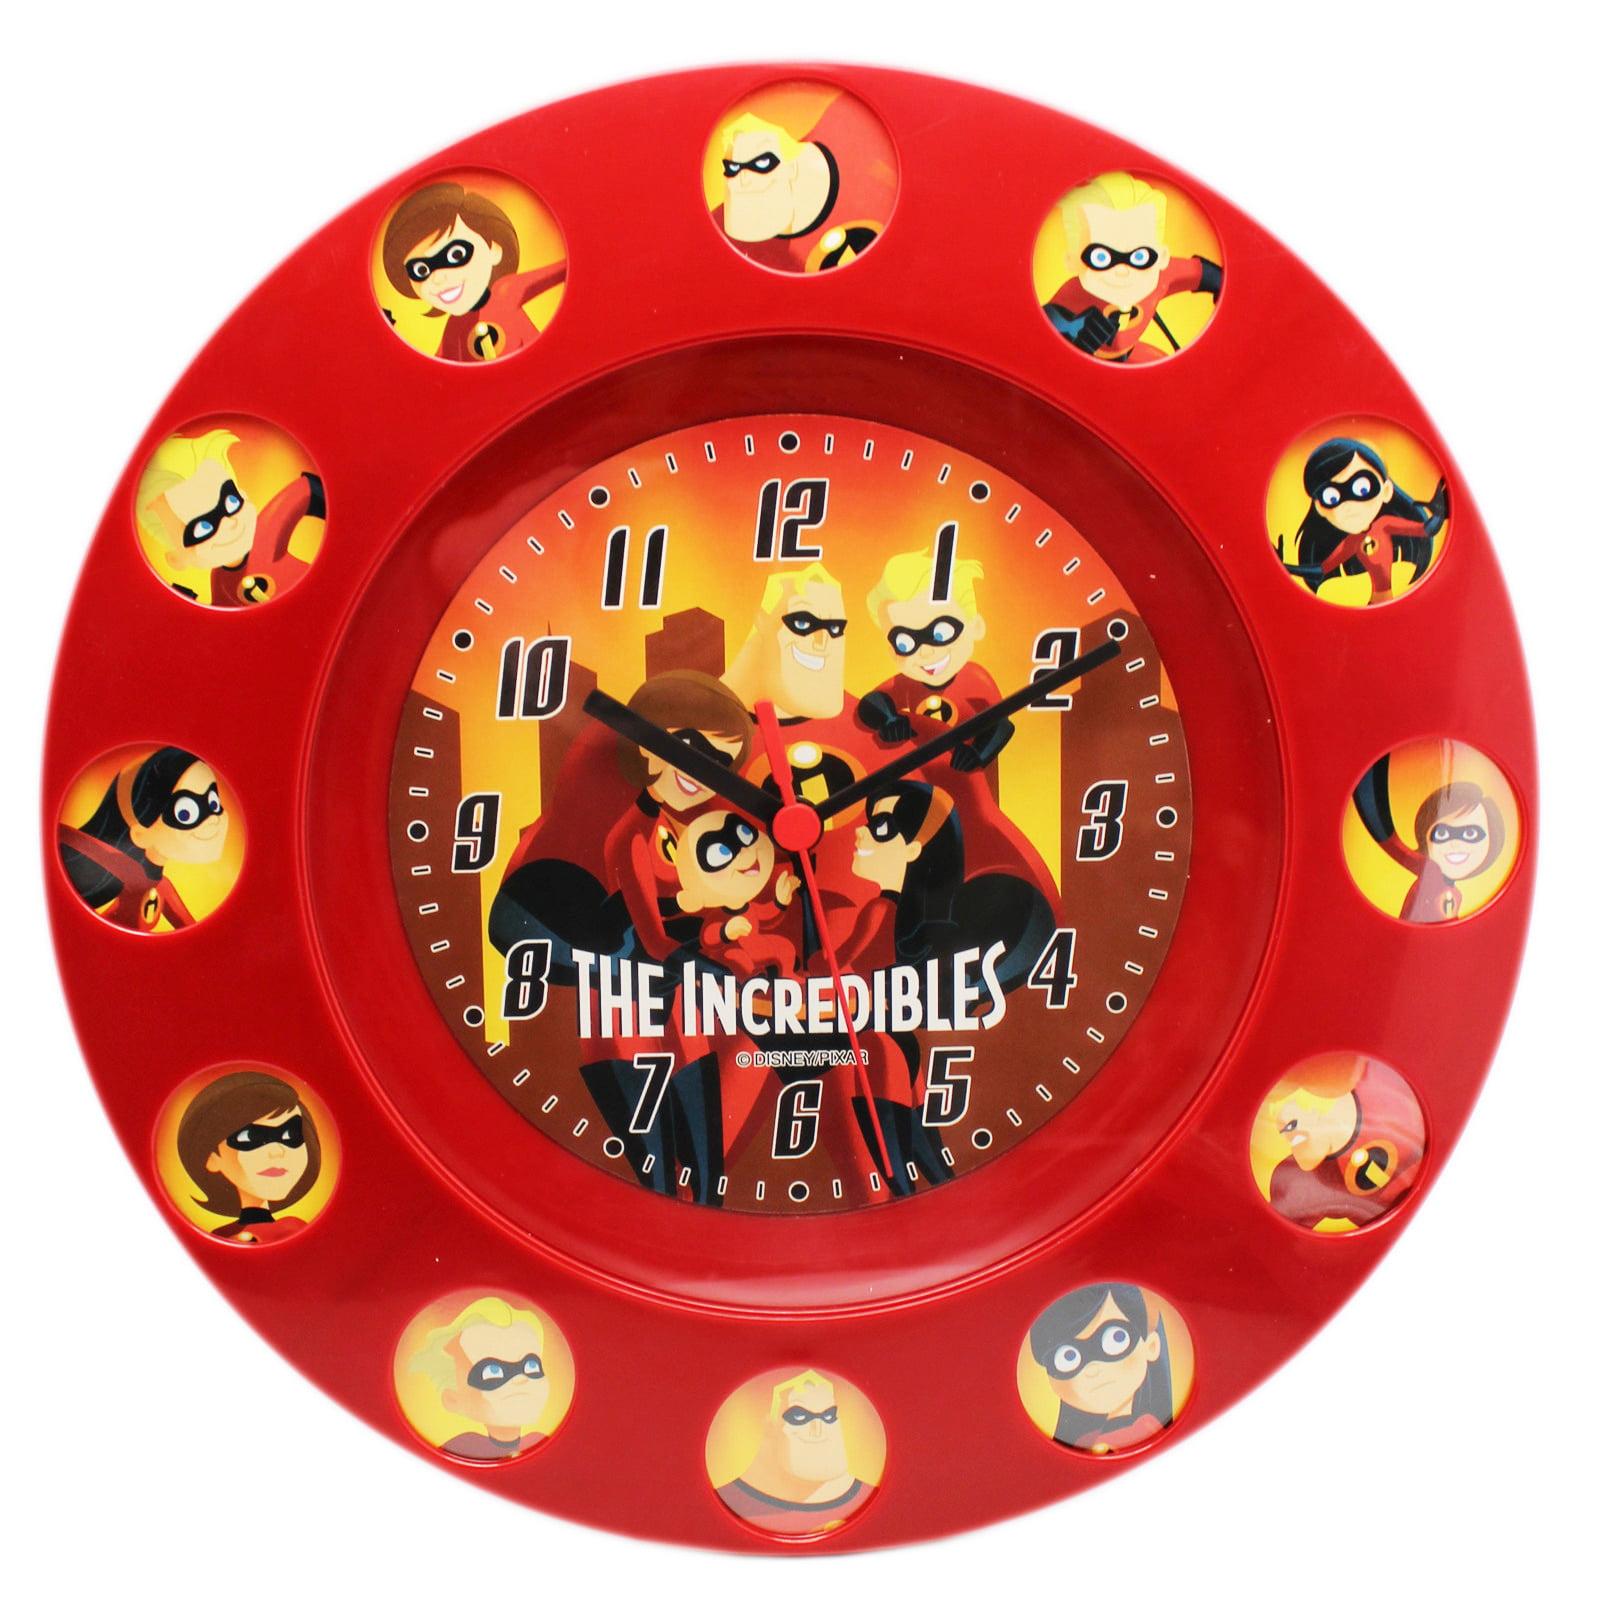 Disney Pixar's The Incredibles Family Portrait Clock